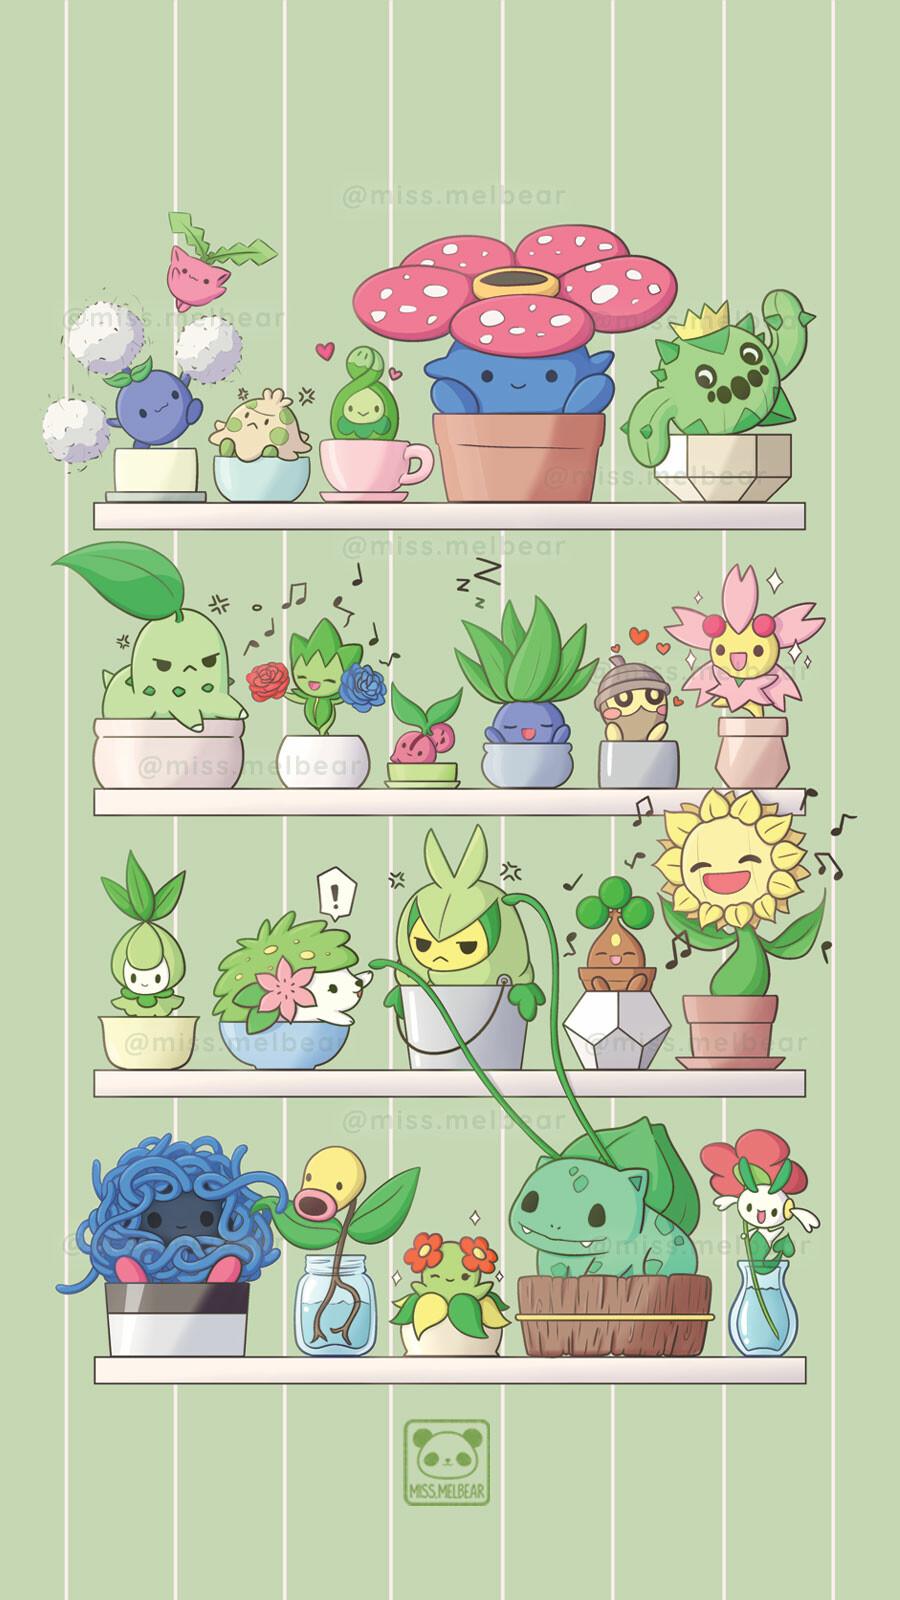 artstation aesthetic pokemon grass edition melissa chan artstation aesthetic pokemon